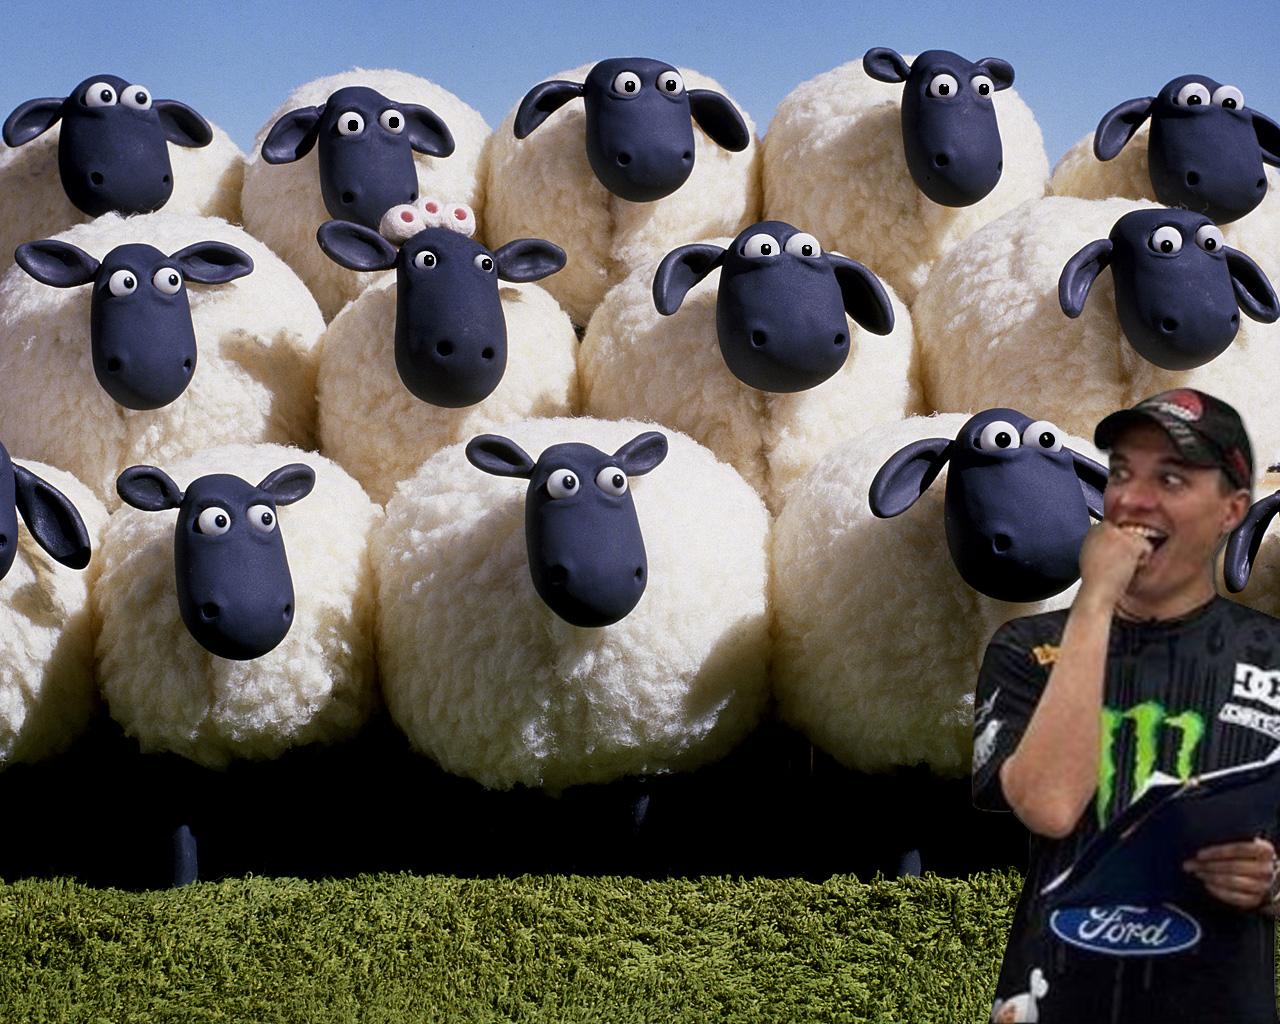 Scared sheep!